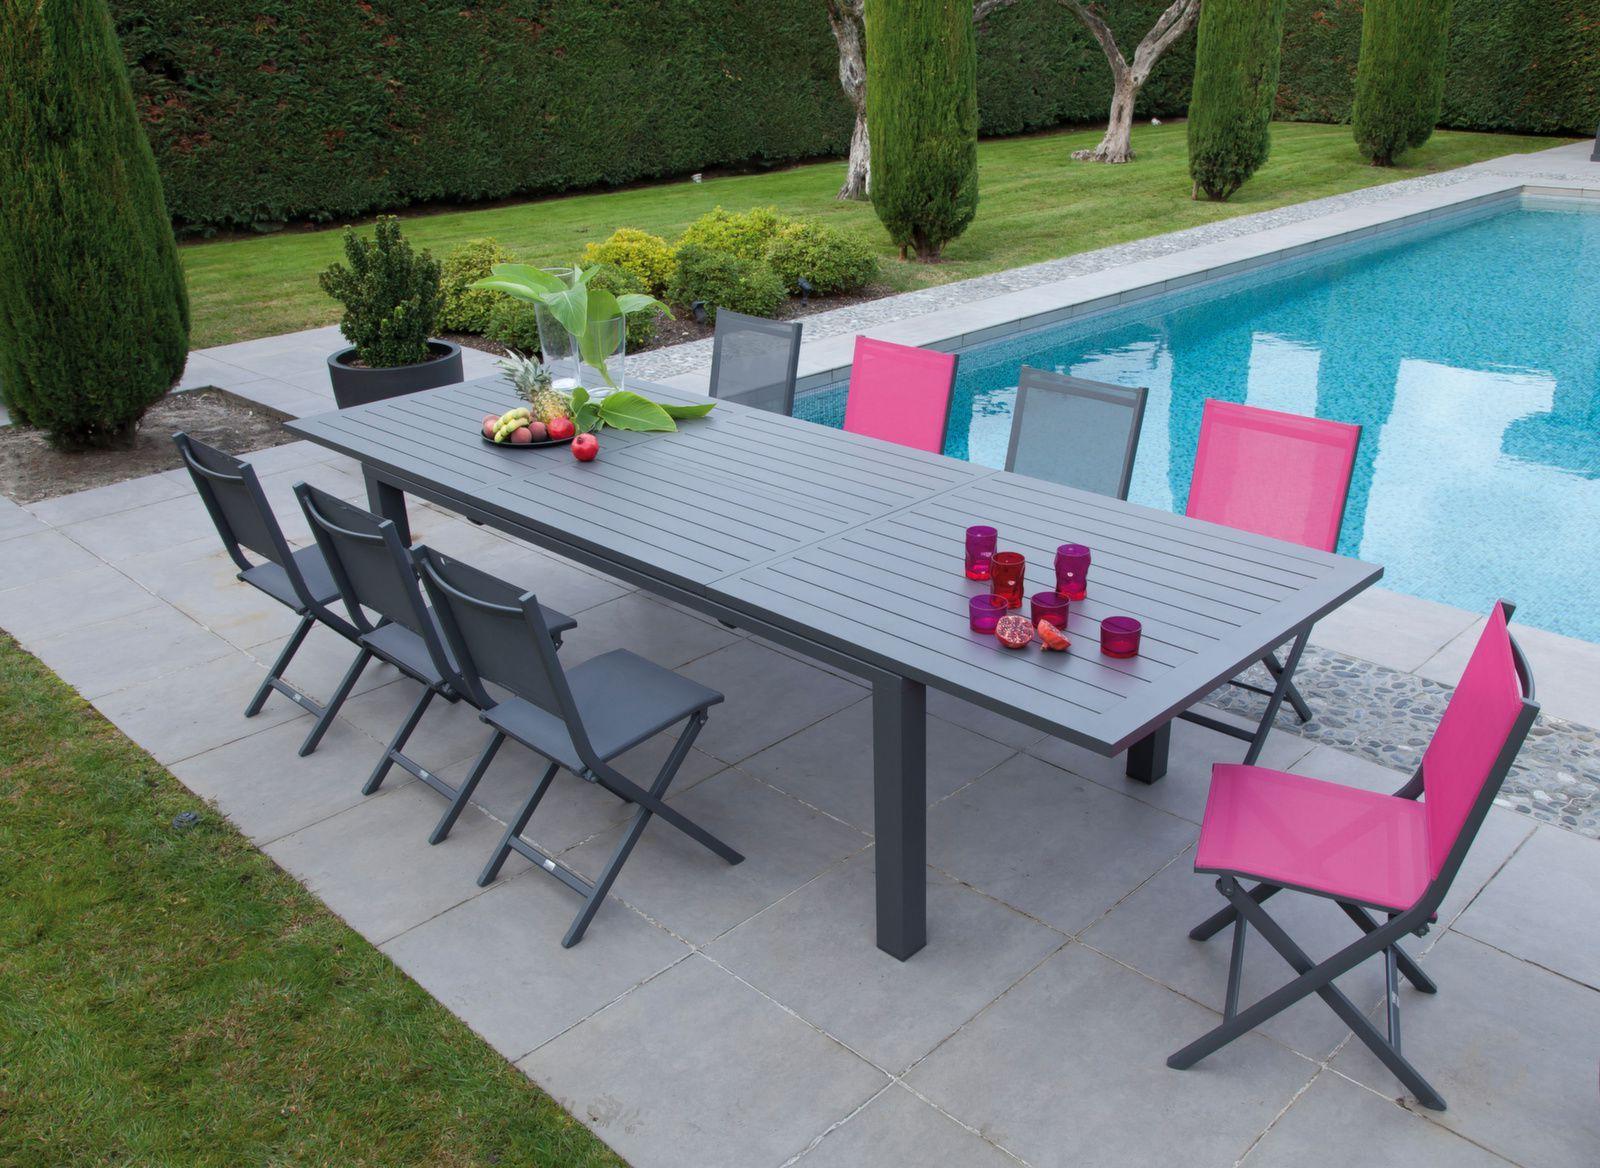 Table De Jardin Design - Heser.vtngcf.org pour Mobilier De Jardin Leroy Merlin